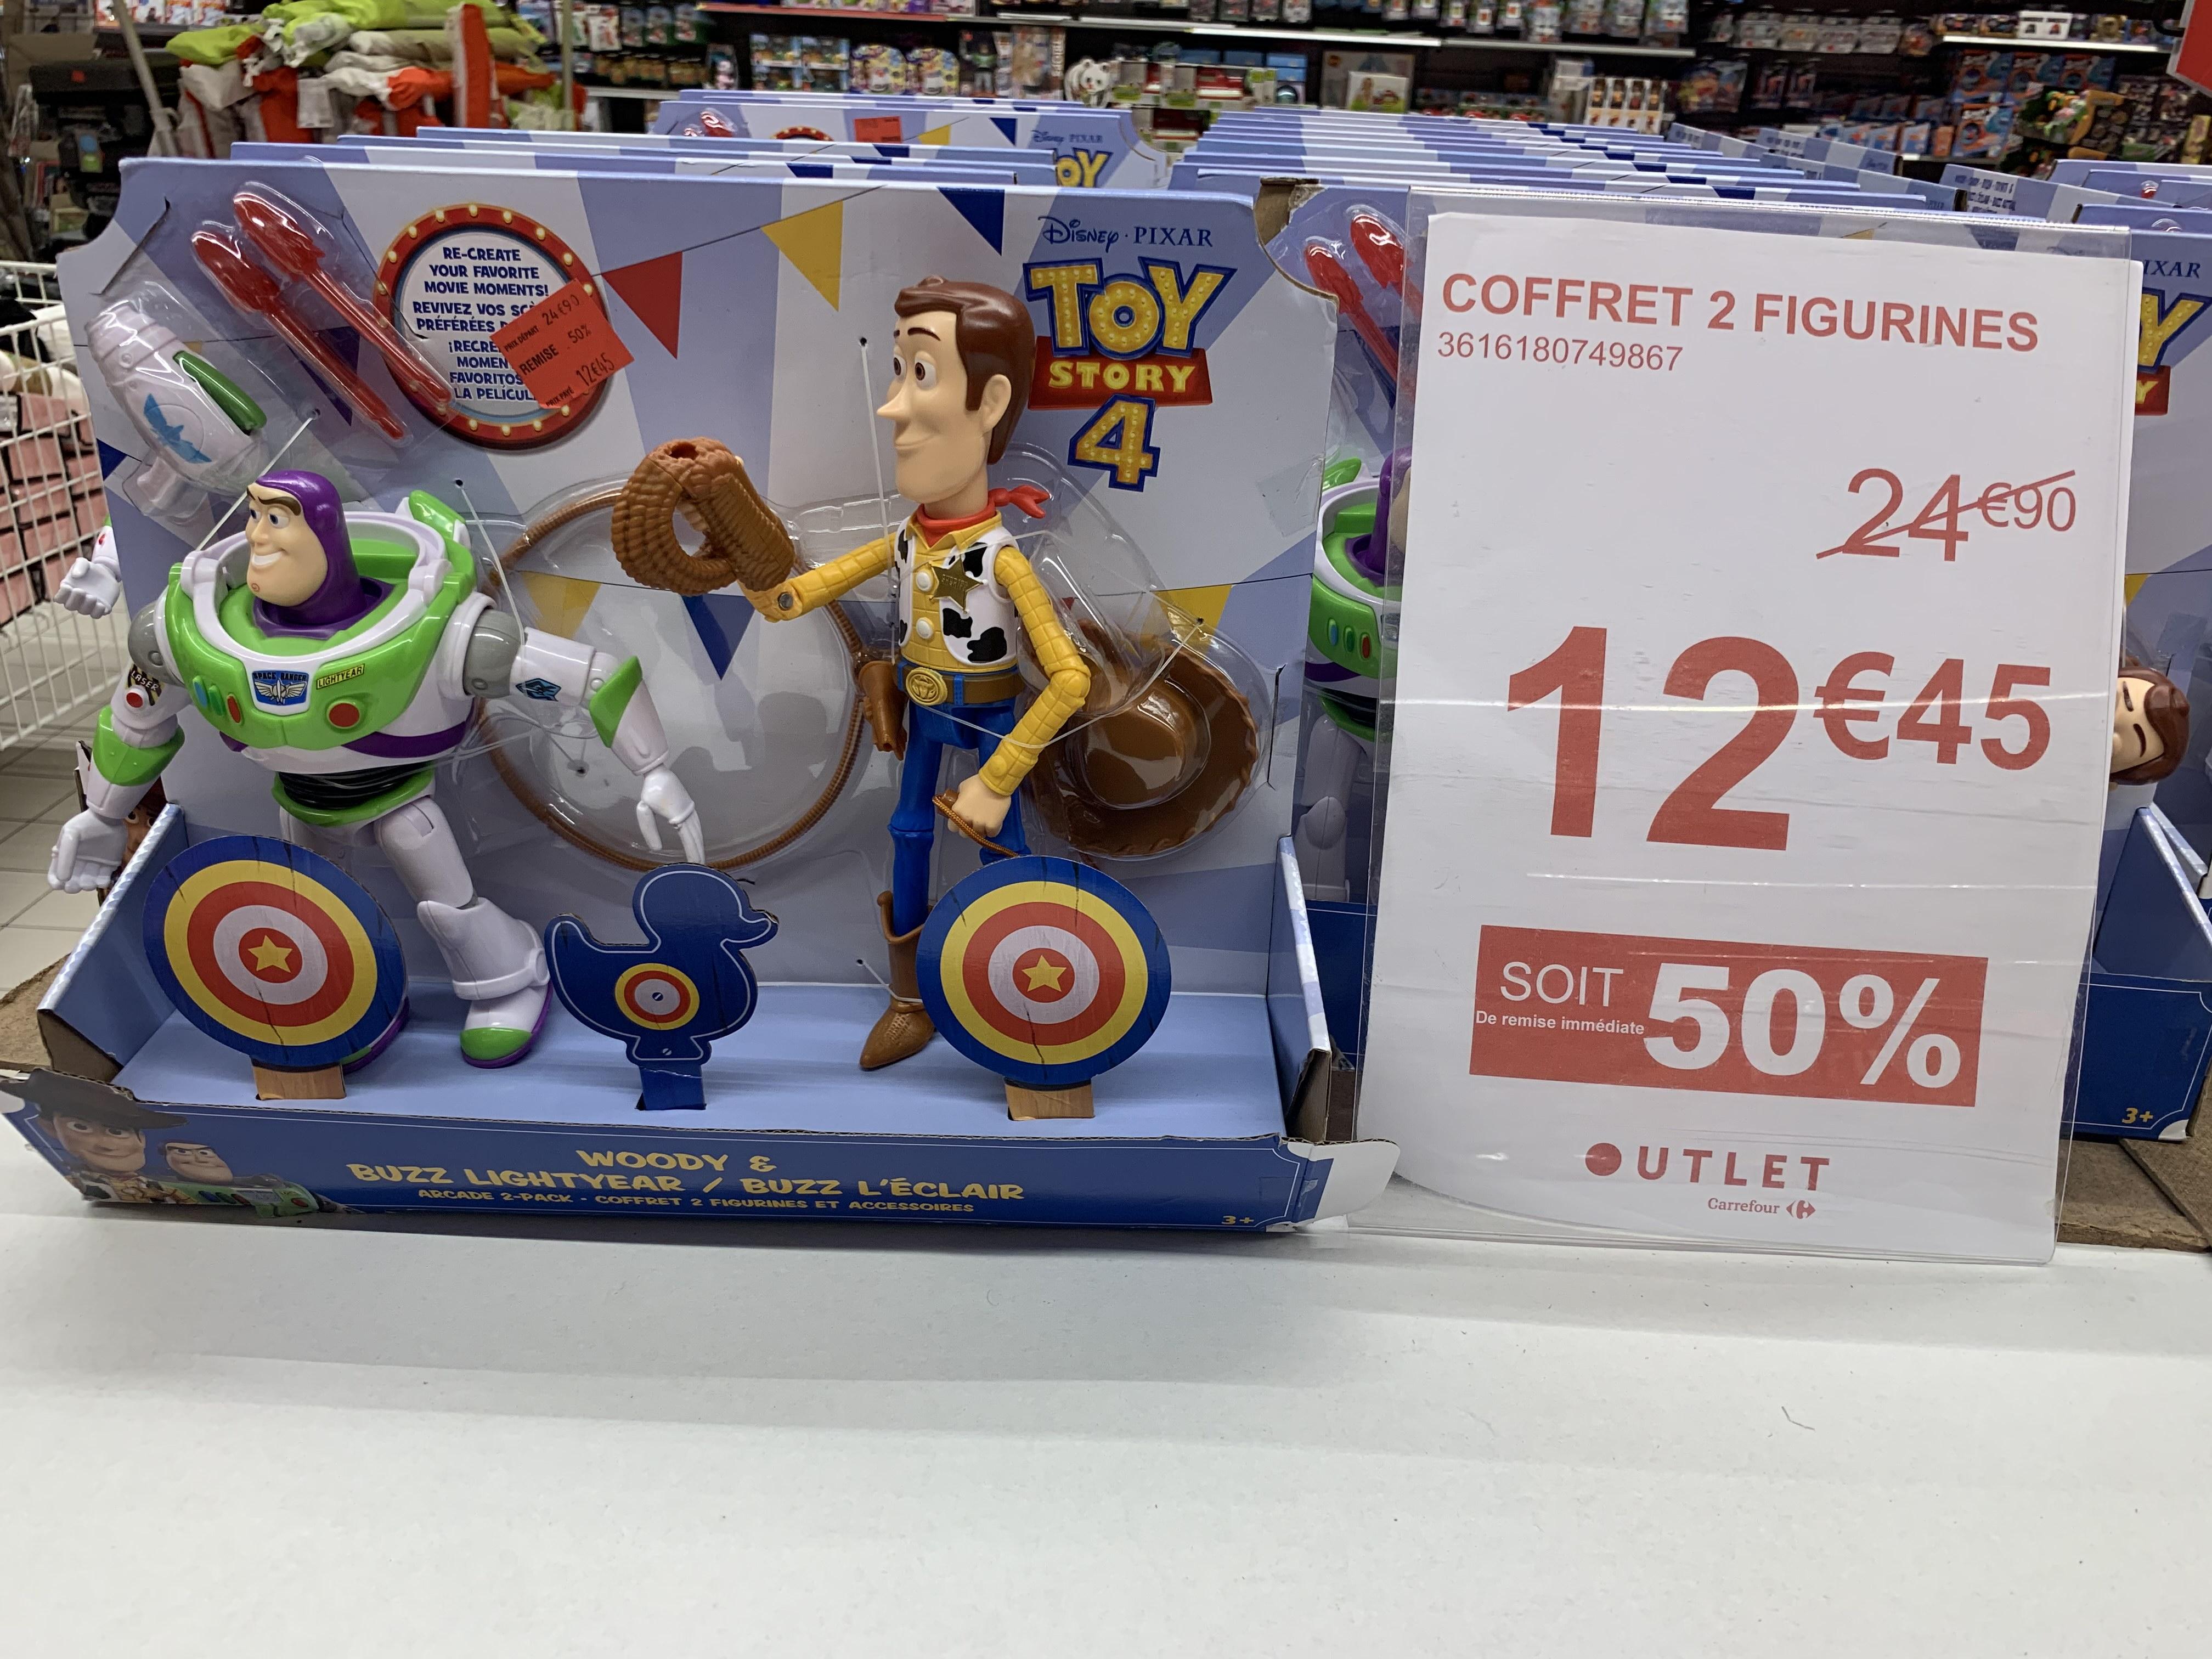 Coffret 2 figurines Toy Story (Sevran 93)